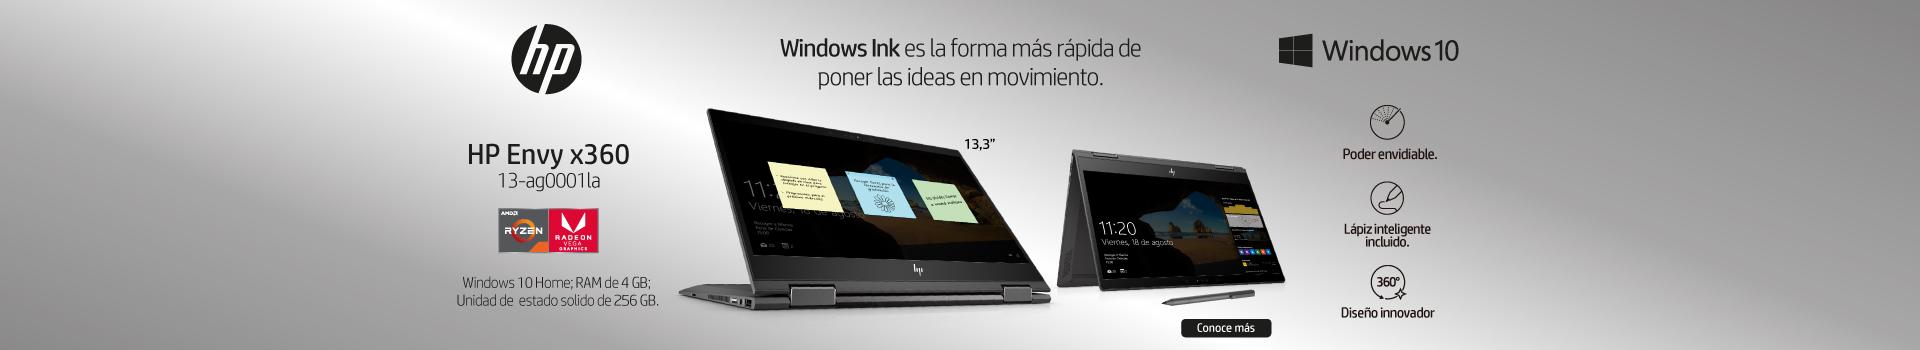 AK-KT-BCA1-4-computadores y tablets-PP-EXP-pauta-windowsHP-Convertible 2 en 1 HP - 13-ag0001la_marzo19GC